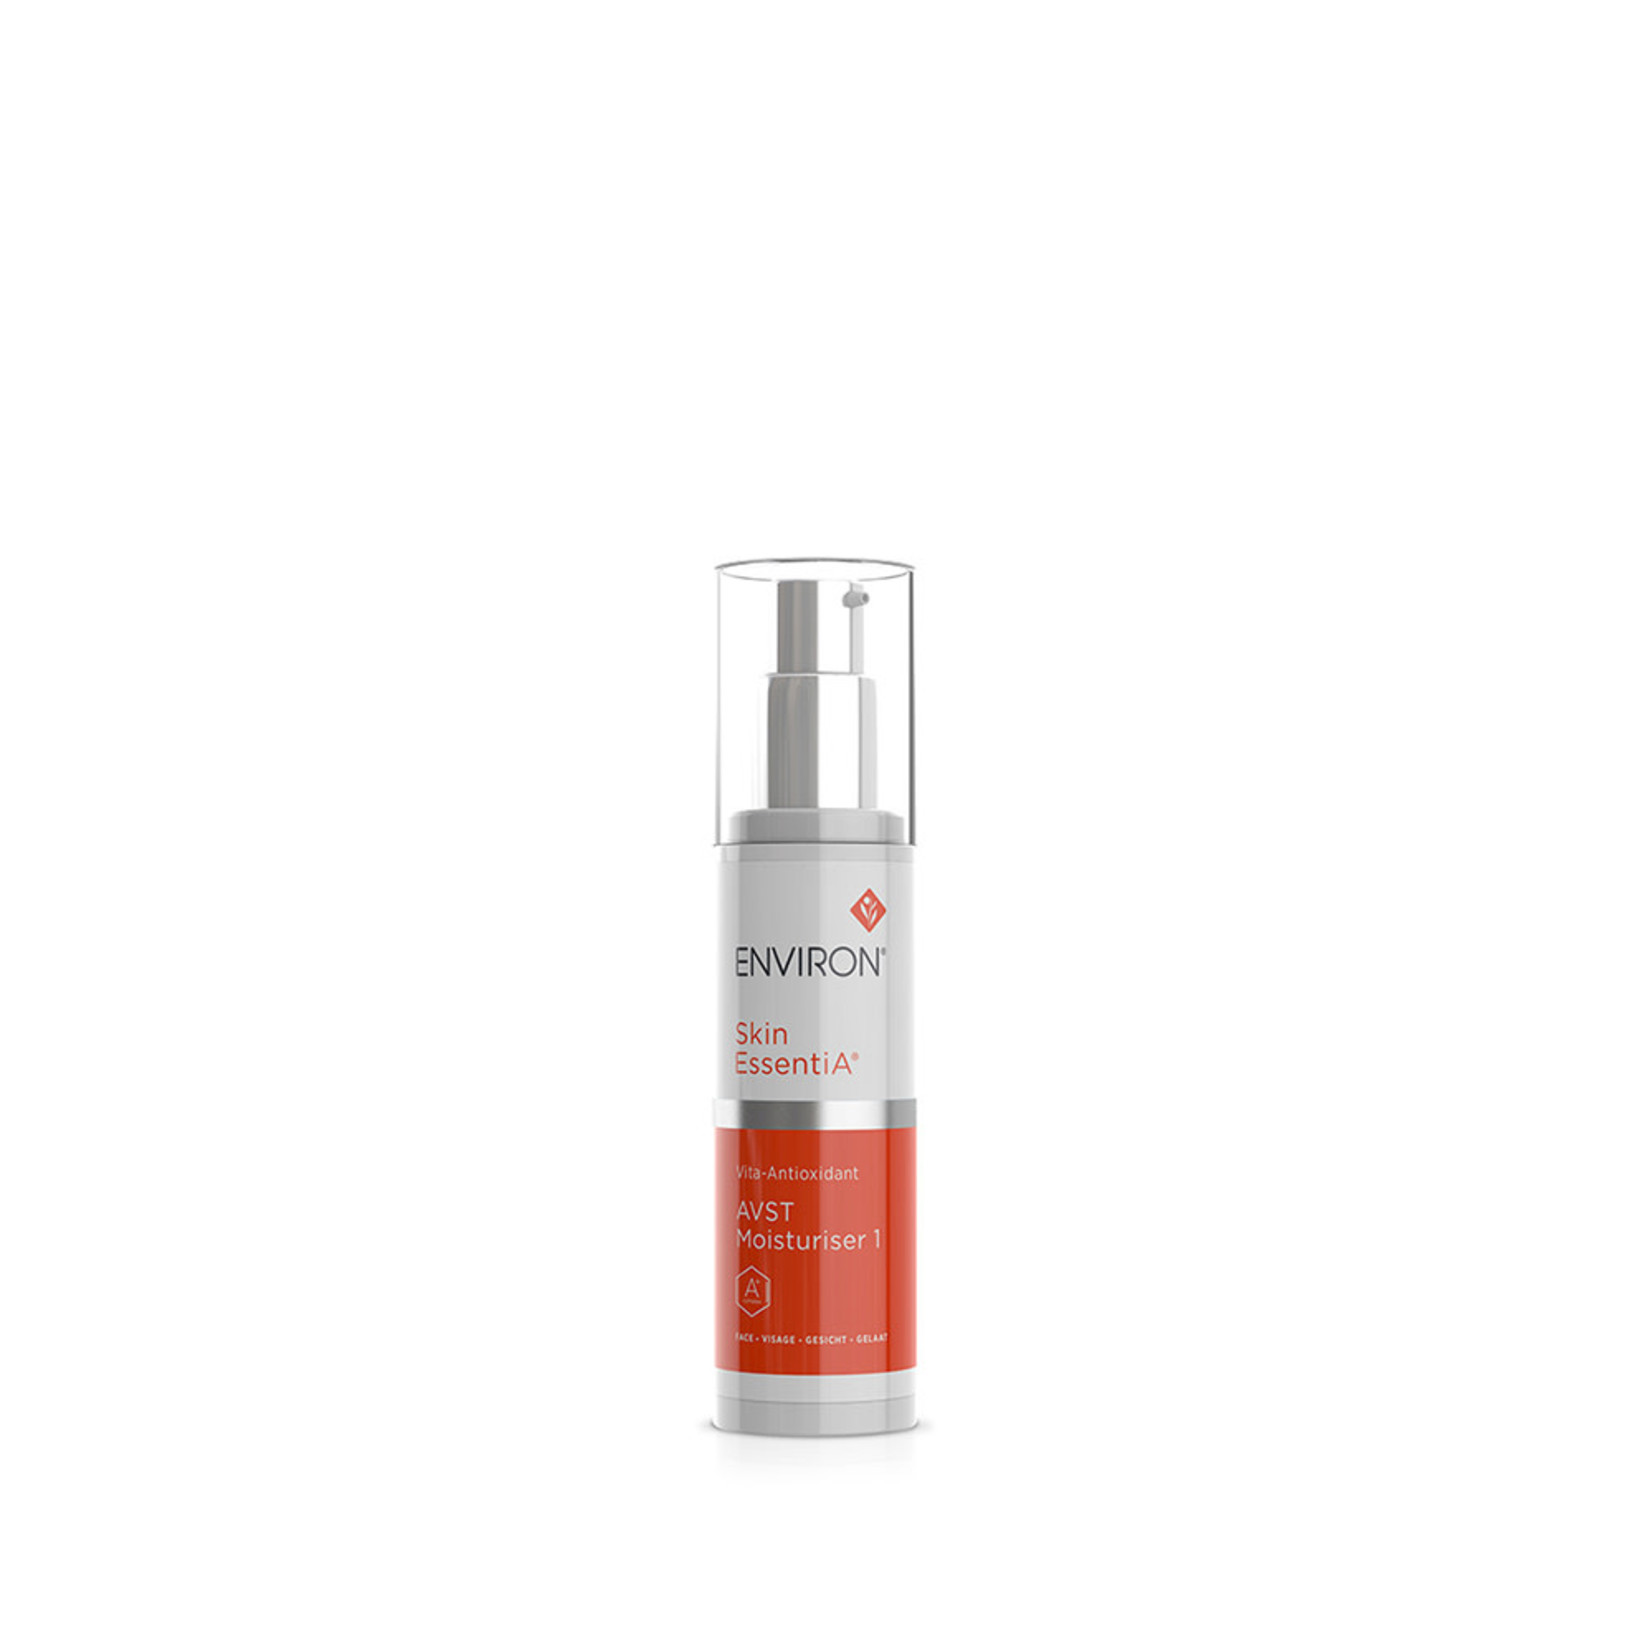 Environ Vita-antioxidant AVST Moisturiser 1 - 50ML